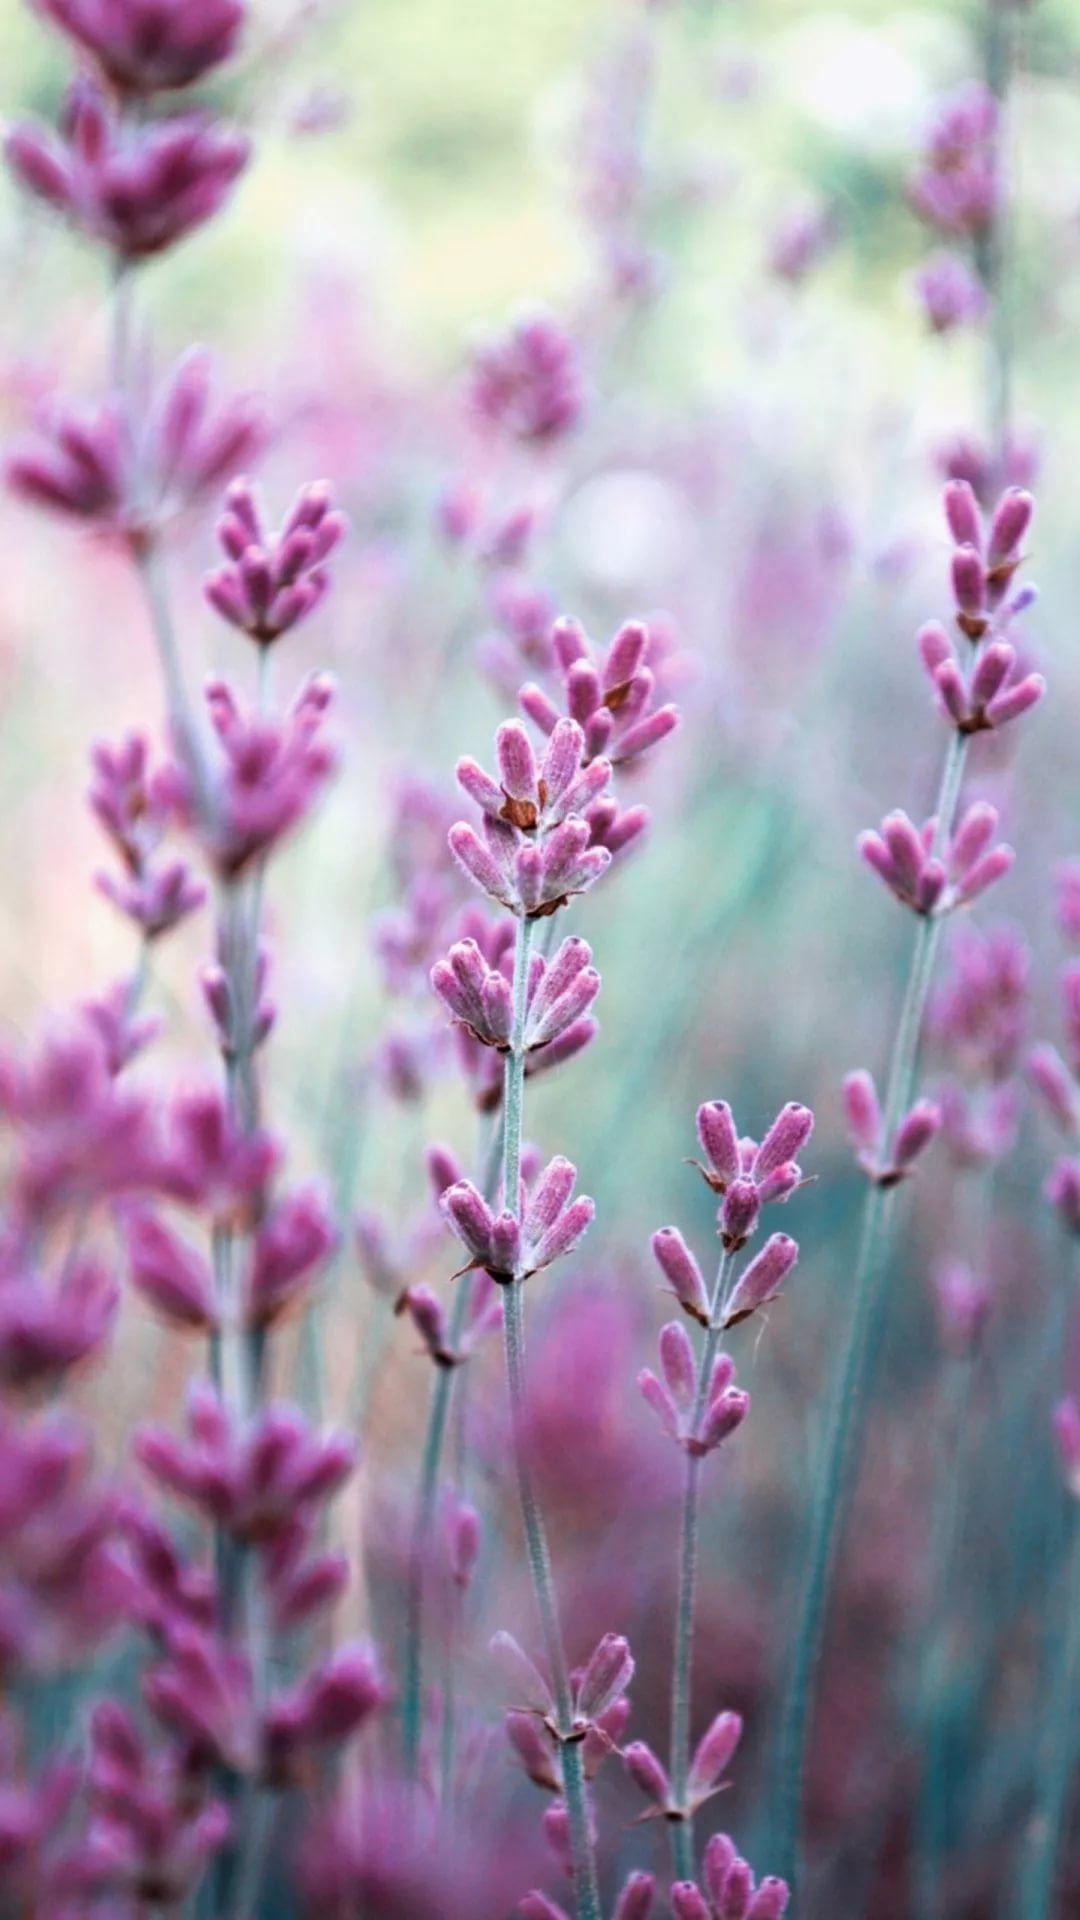 17 Lavender Iphone Wallpapers Wallpaperboat Find lavender pictures and lavender photos on desktop nexus. 17 lavender iphone wallpapers